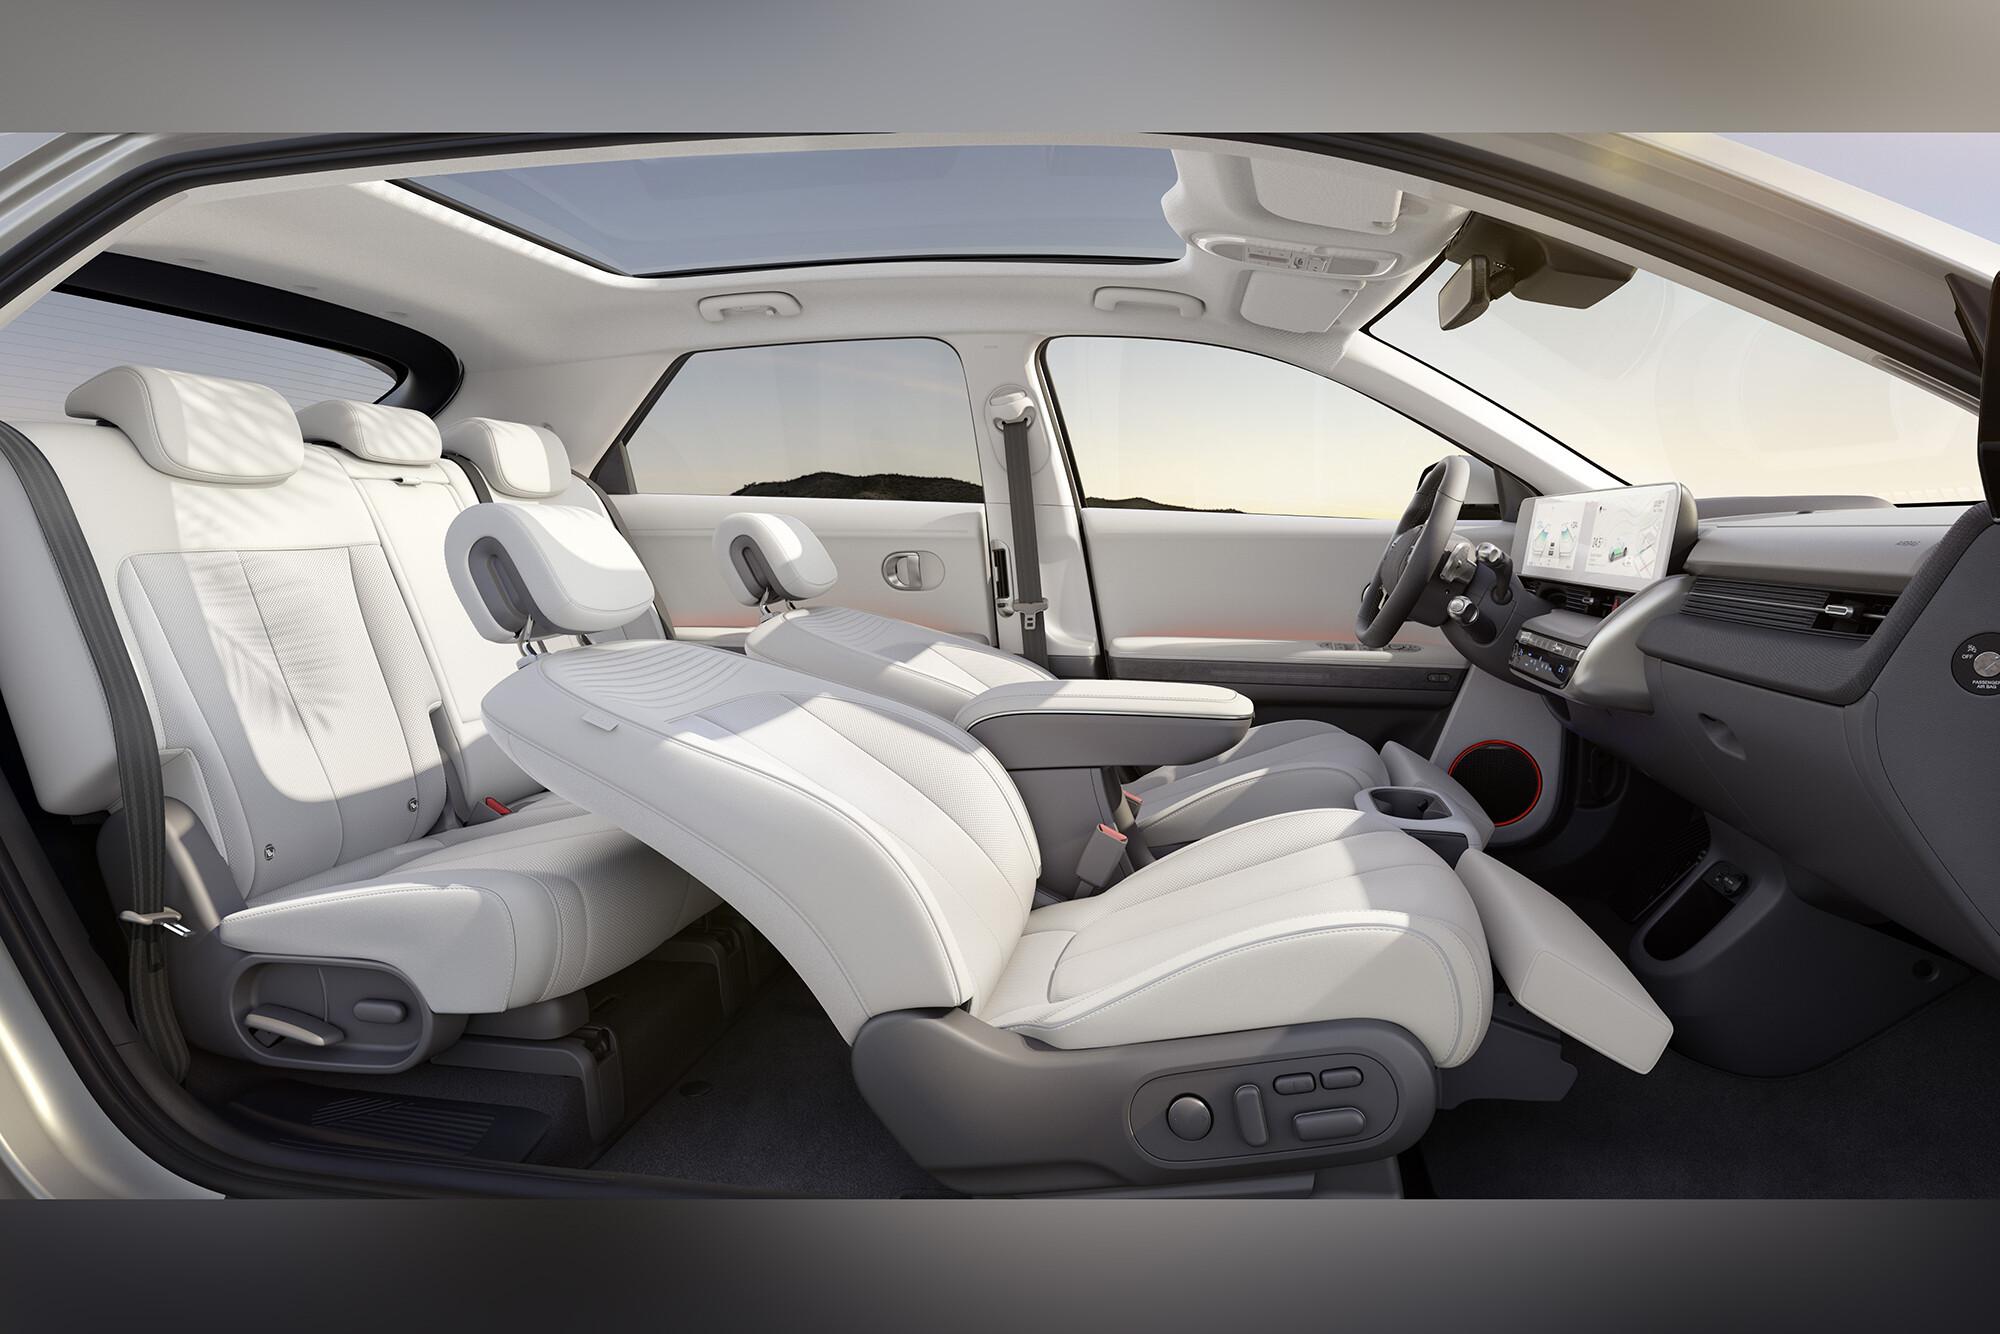 Archive Whichcar 2021 02 23 1 2022 Hyundai Ioniq 5 Electric Vehicle Revealed 13